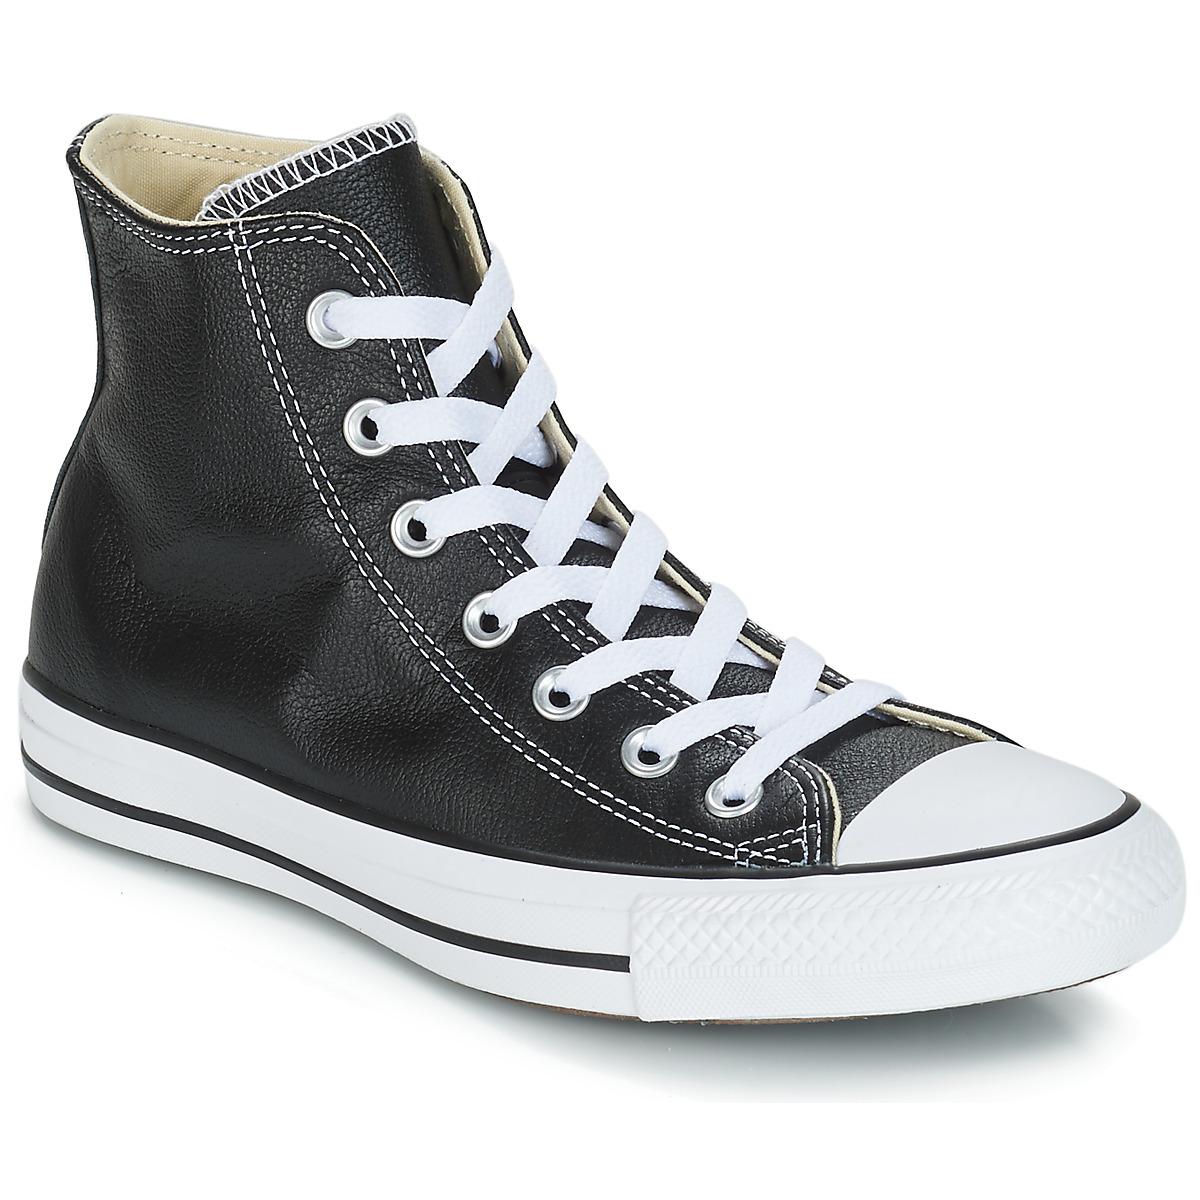 Converse Chuck Taylor All Star CORE LEATHER HI Black